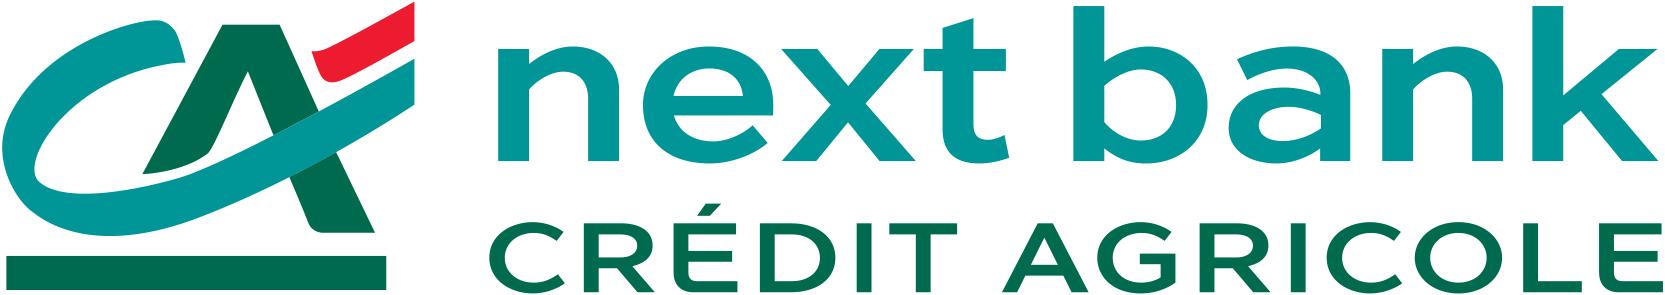 CREDIT AGRICOLE next bank (Suisse) SA